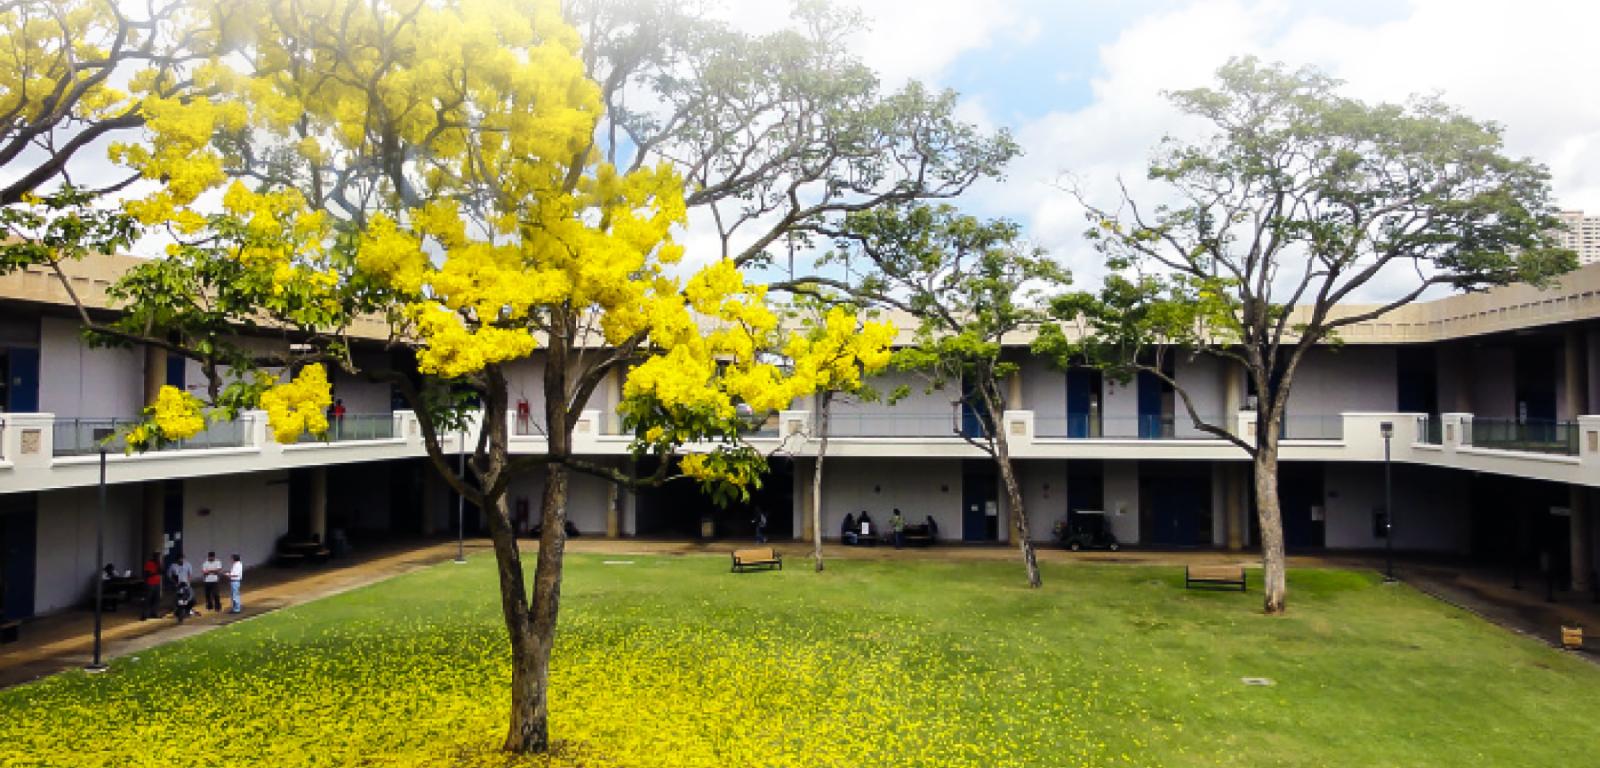 School image 0